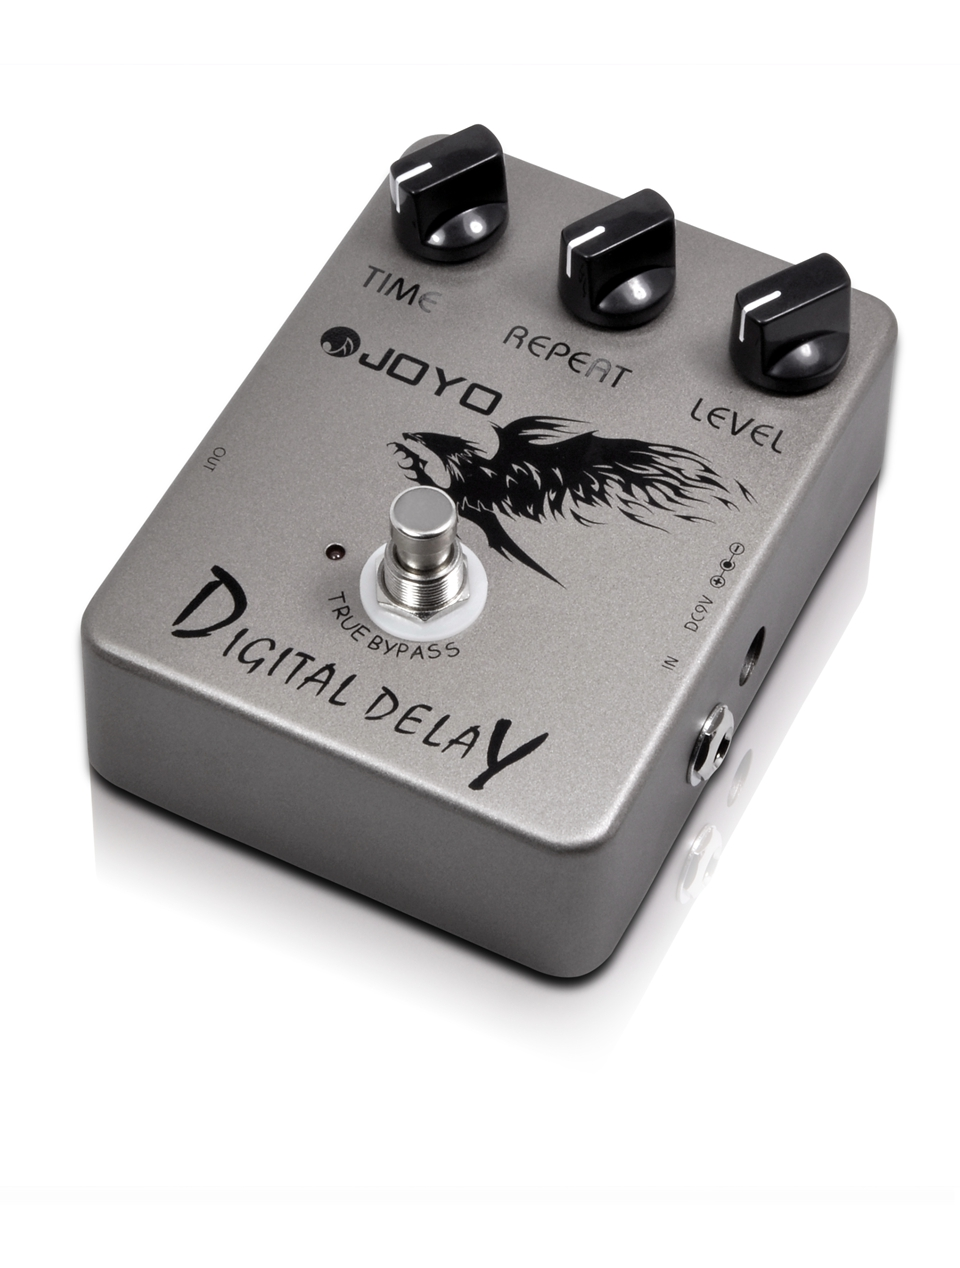 JOYO Digital Delay Guitar Effect Pedal Time Delay Repeat Level Adjustment Close To Analog Delay 25ms-200ms Delay Range